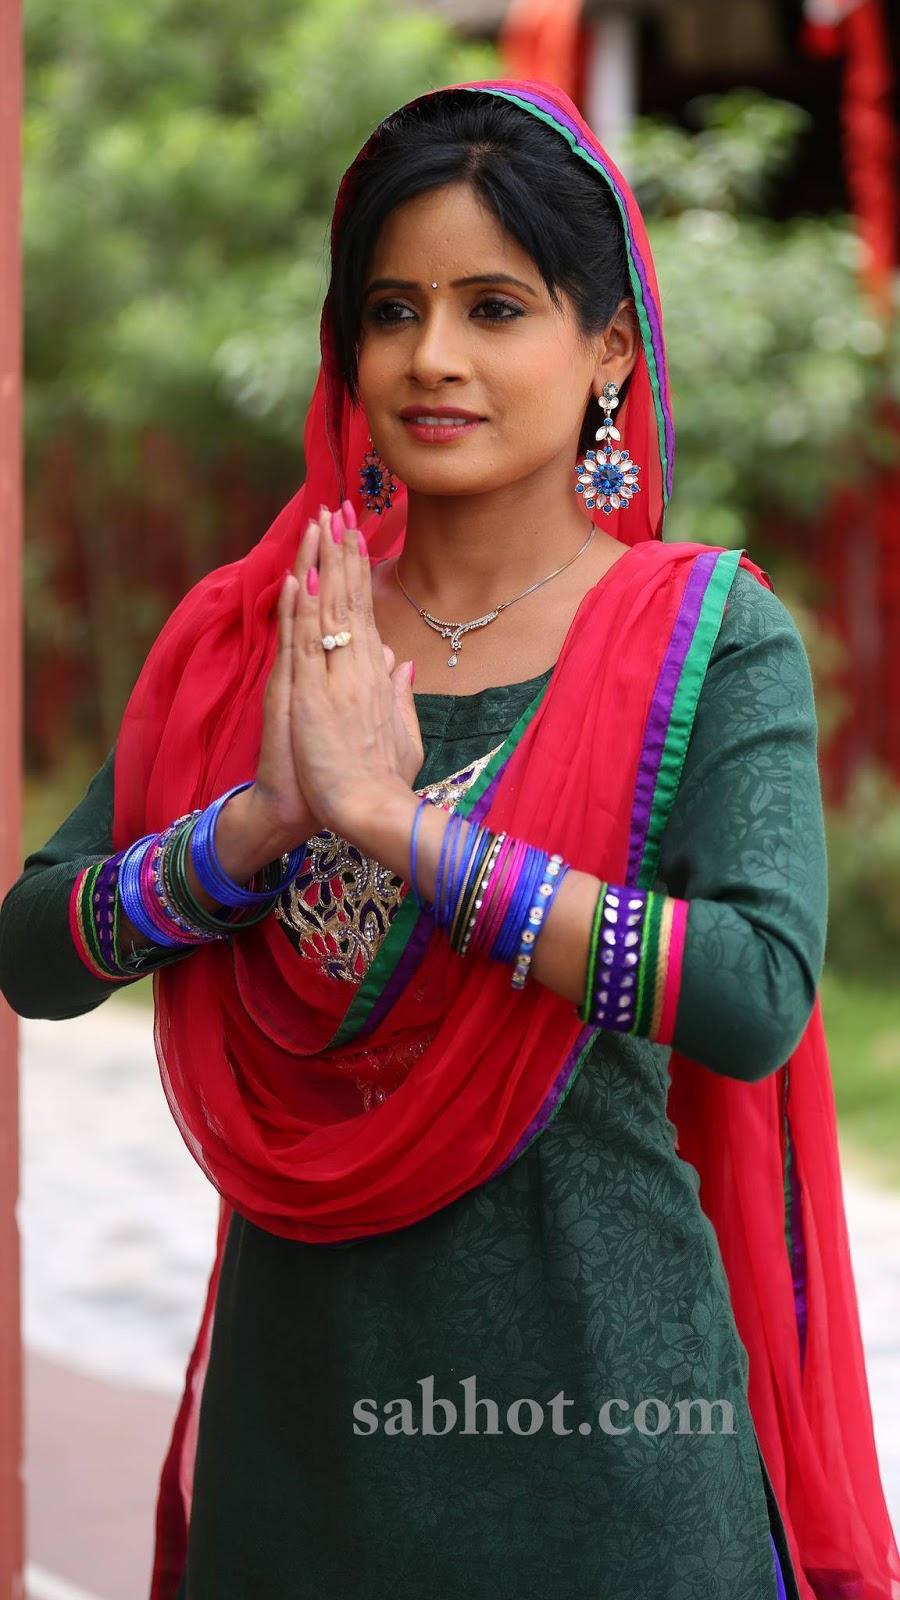 Miss Poojas Unseen Photos - Sabwoodcom-8665